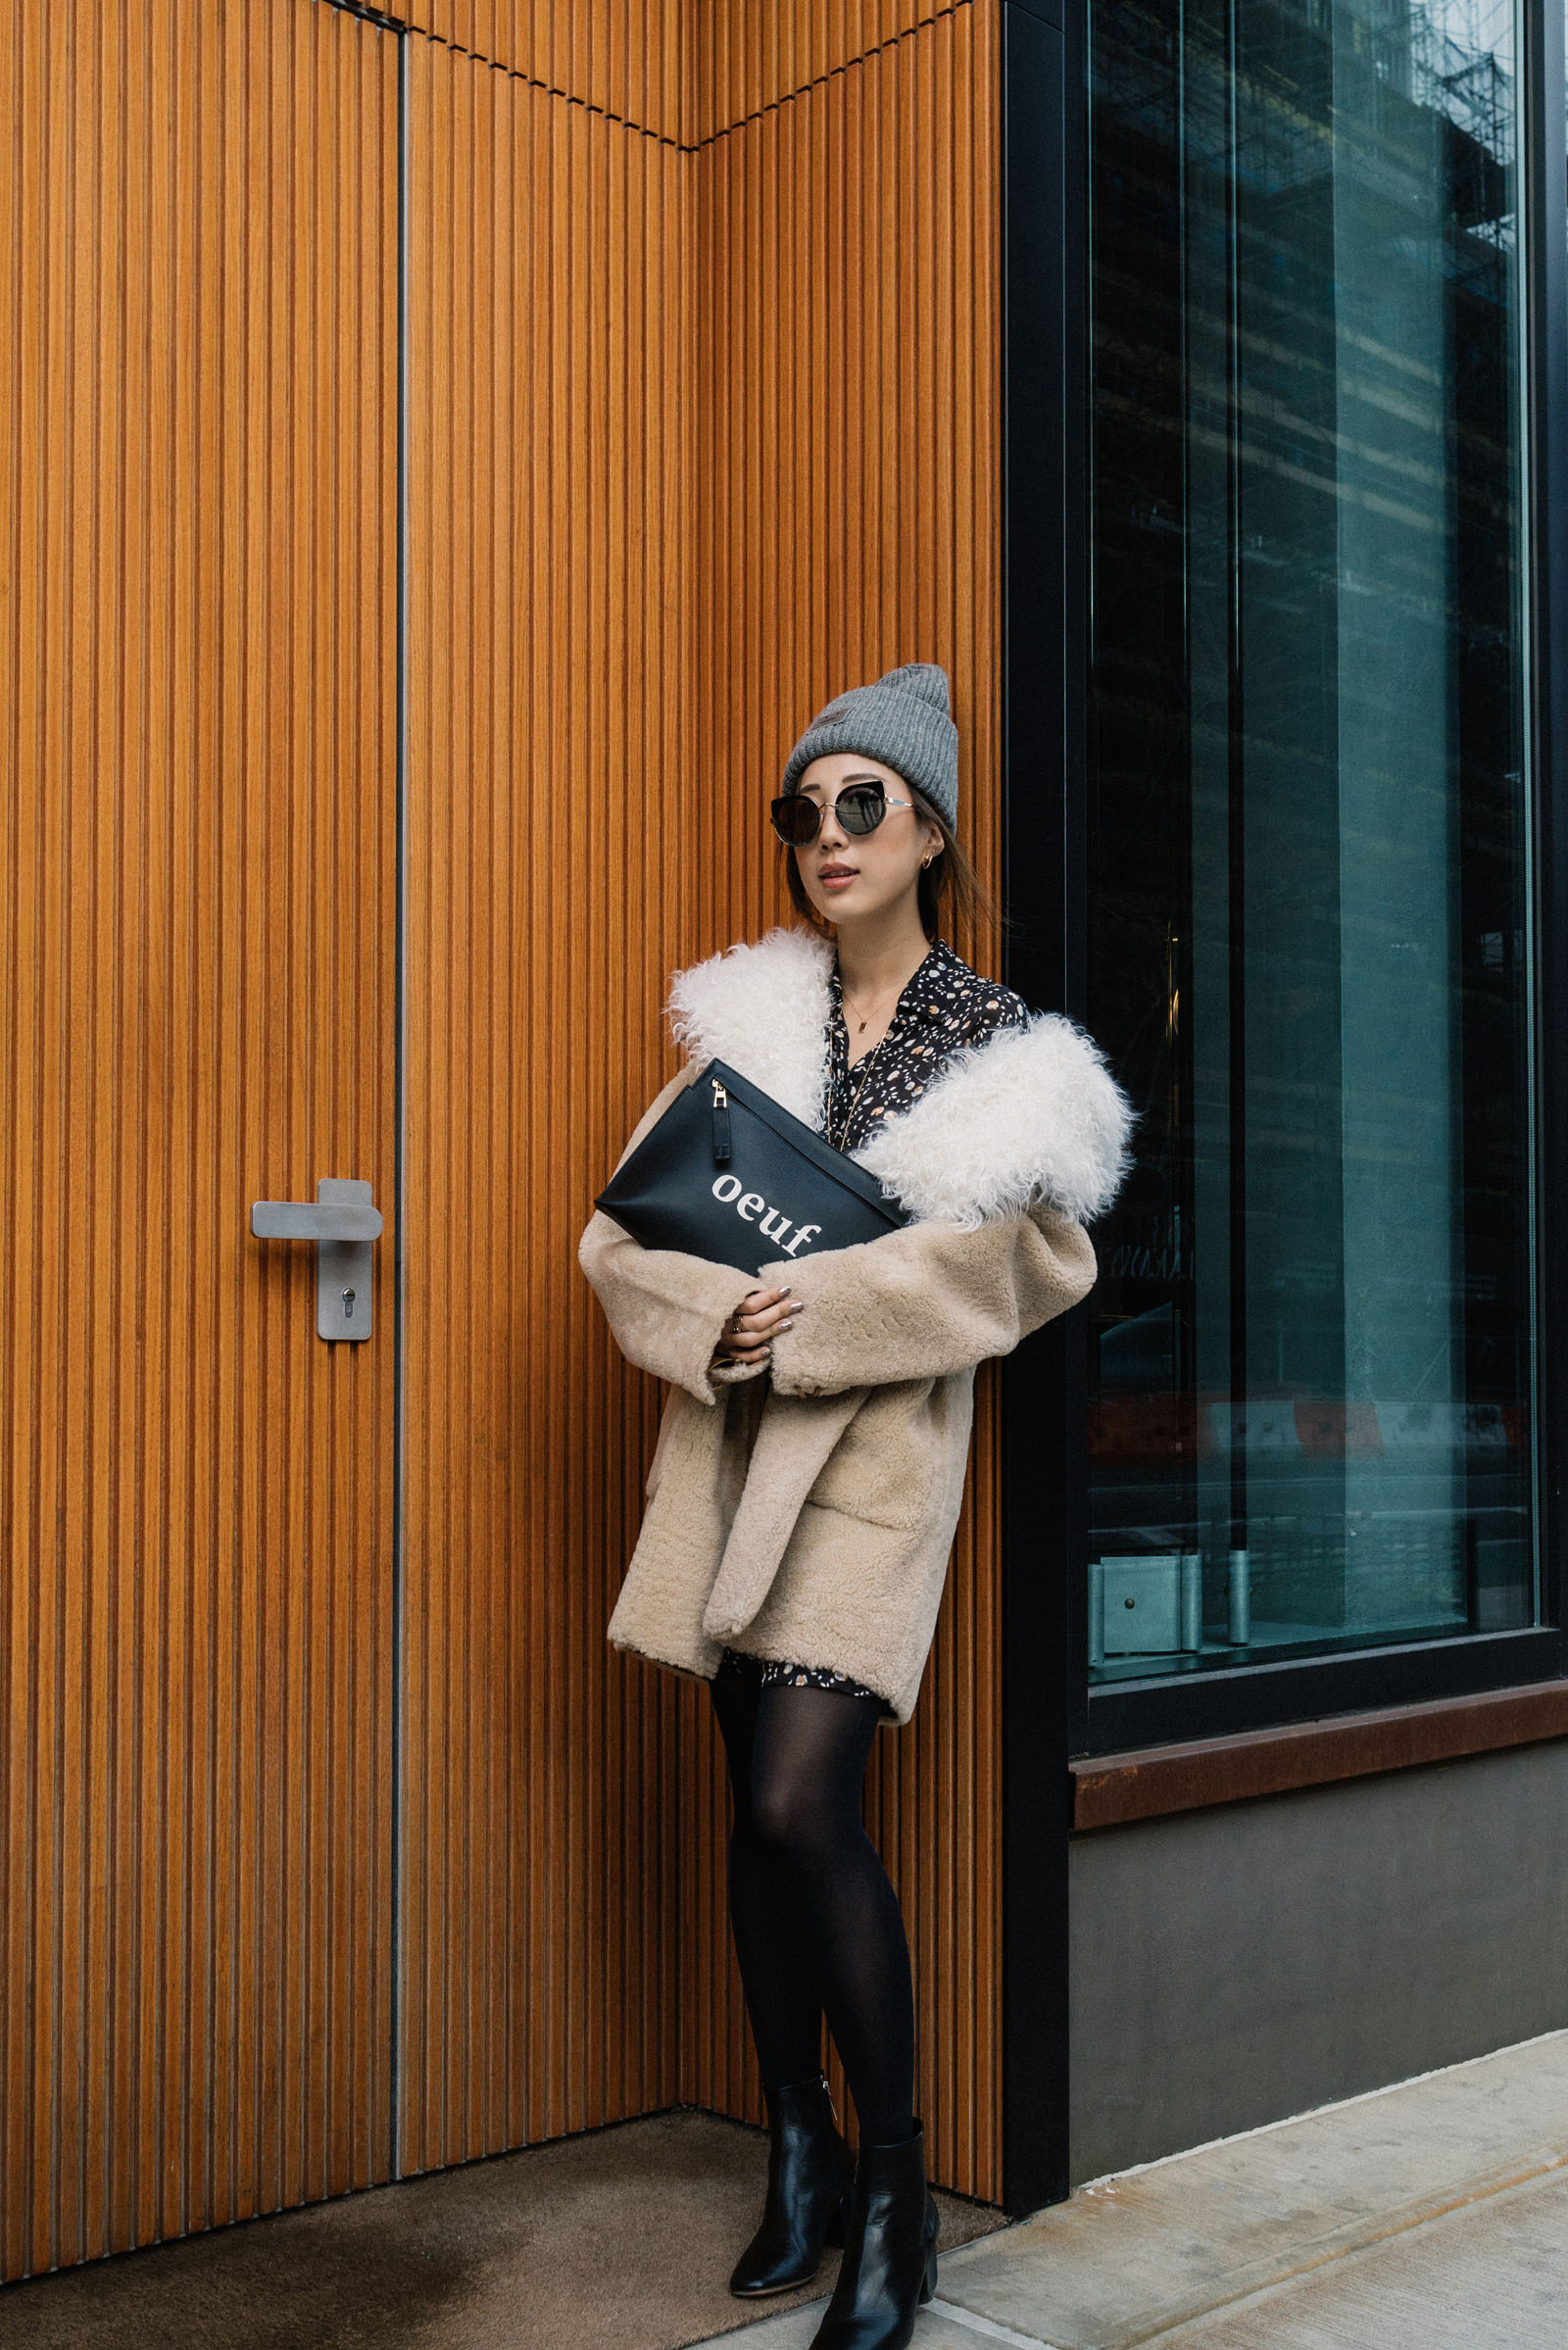 Ulla Johnson Coat ,  Sachin & Babi Dress , The Row Boots, Loewe Clutch,  Gentle Monster x Moooi Sunglasses , Acne Studios Beanie